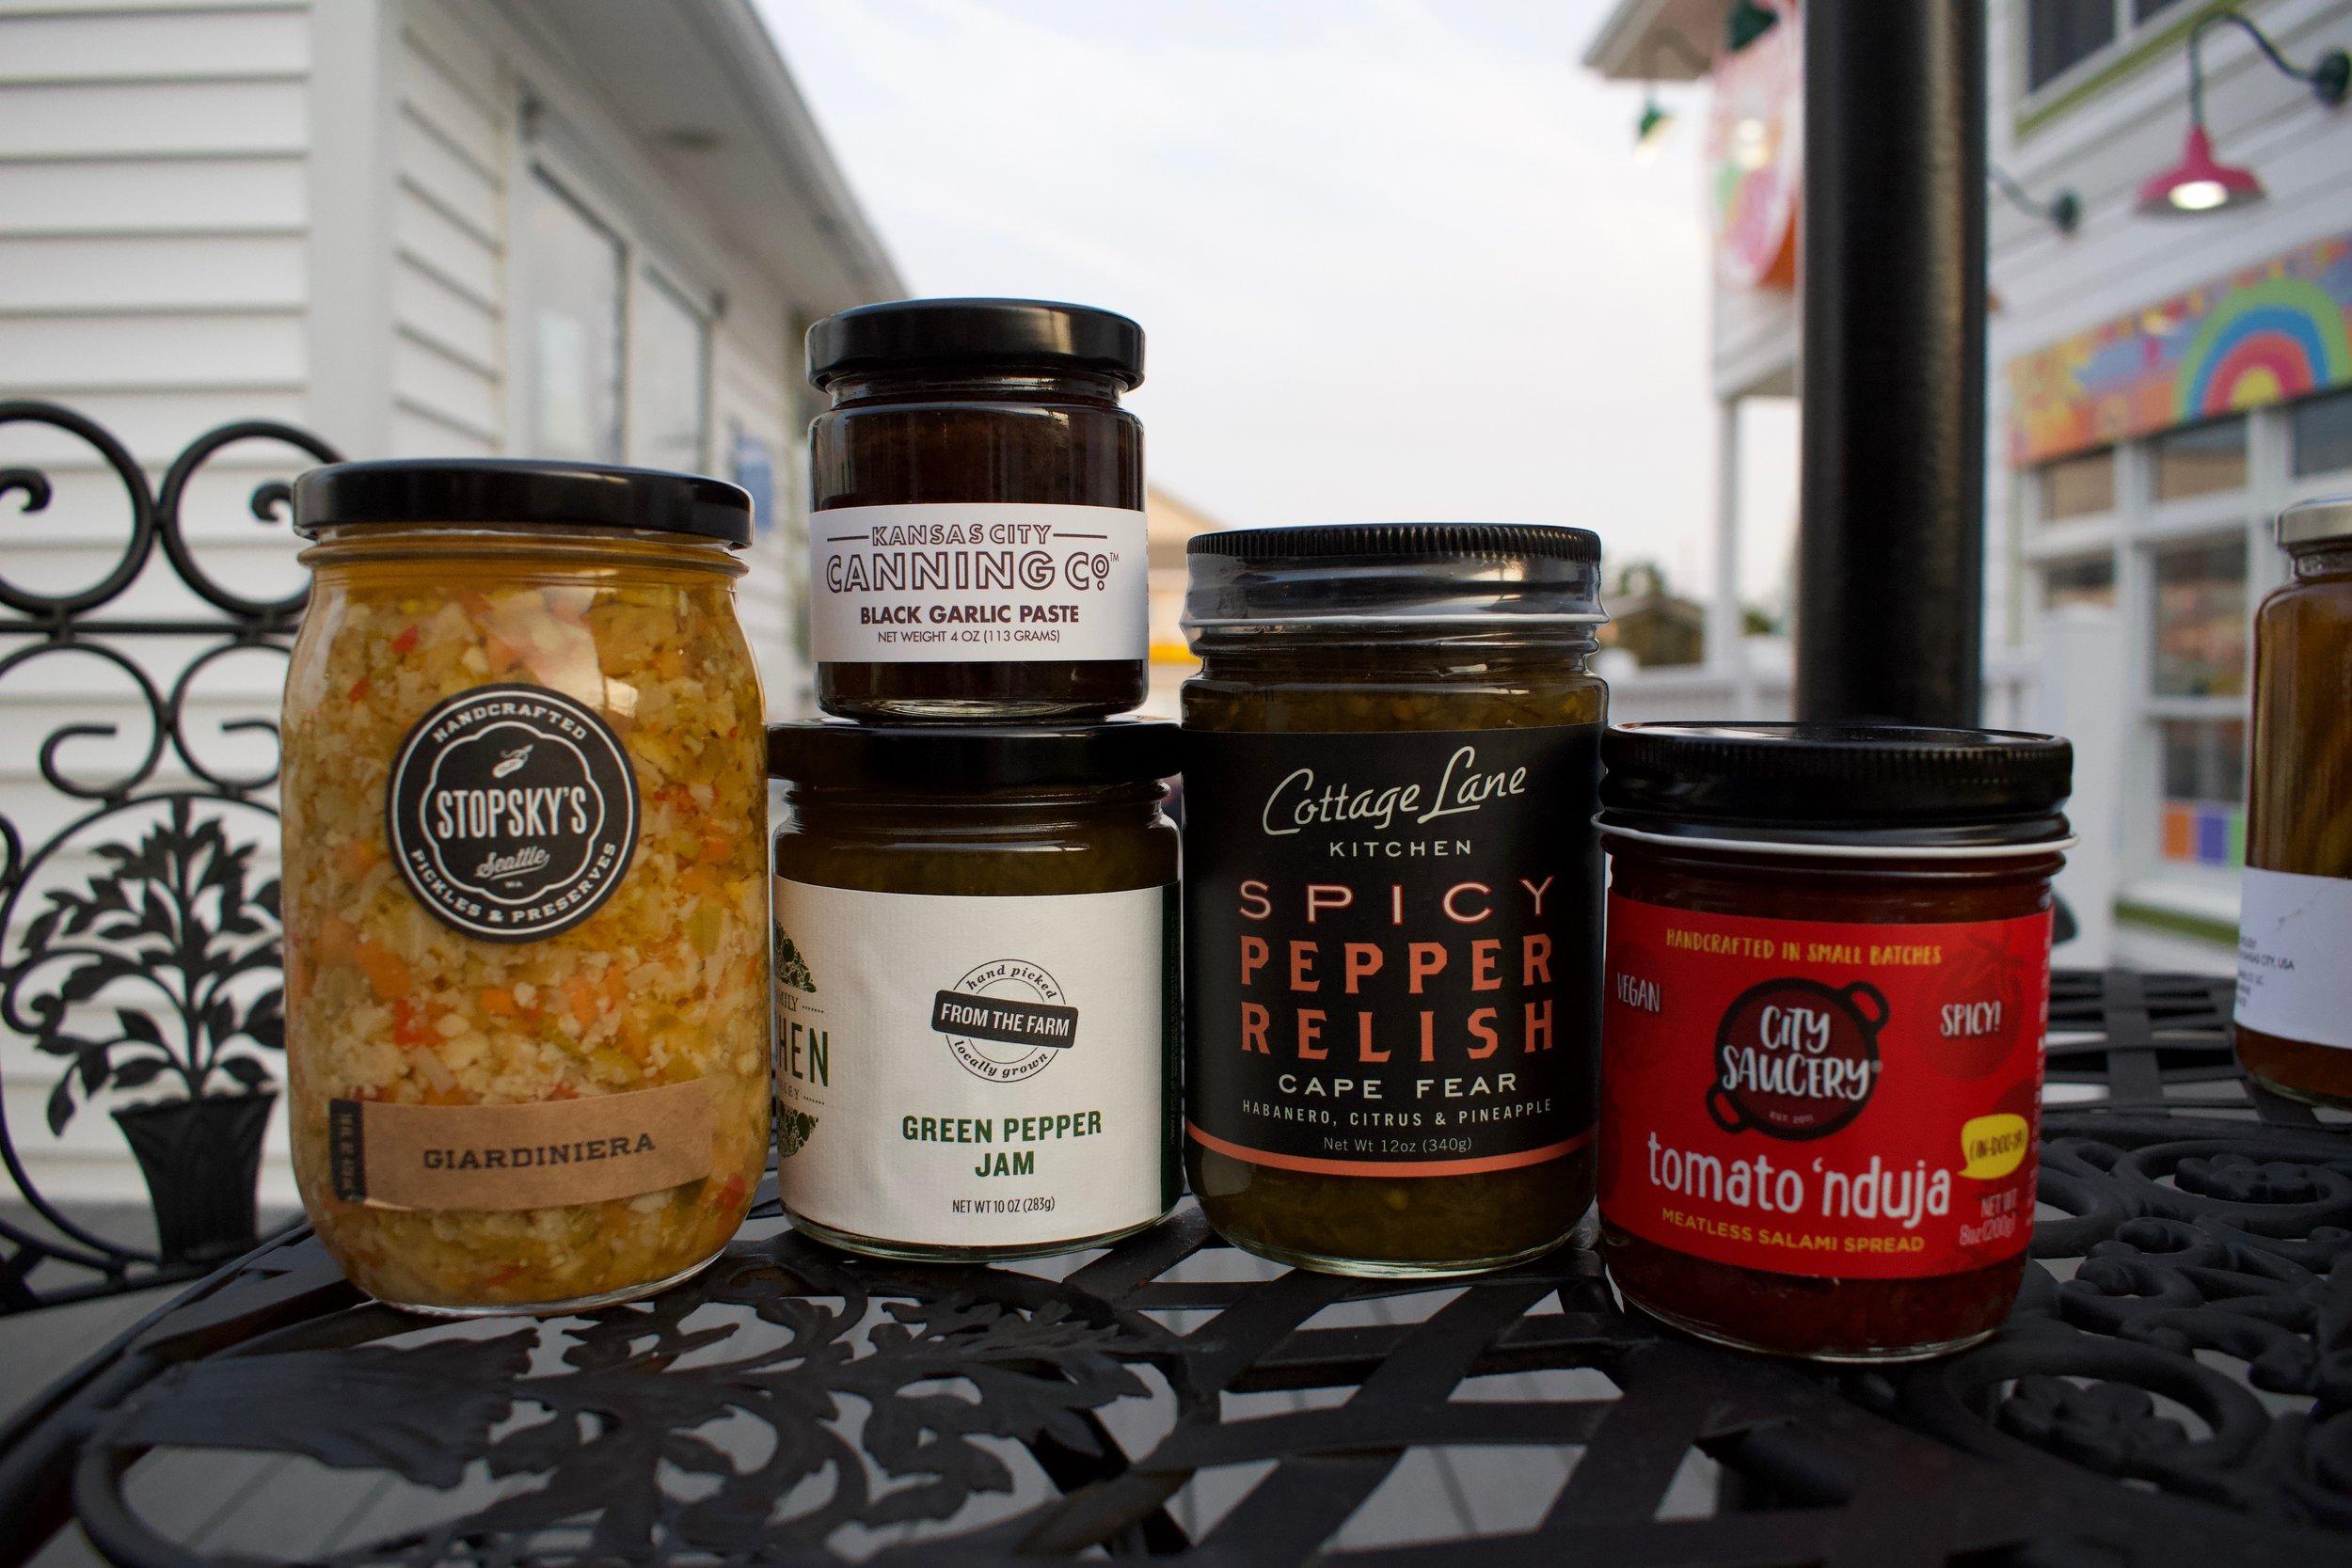 12. Stopsky's Giardiniera, Kansas City Canning co. Black Garlic Paste, Clif Family Kitchen Green Pepper Jam, Cottage Lane Kitchen Spicy Pepper Relish, City Saucery Tomato 'nduja